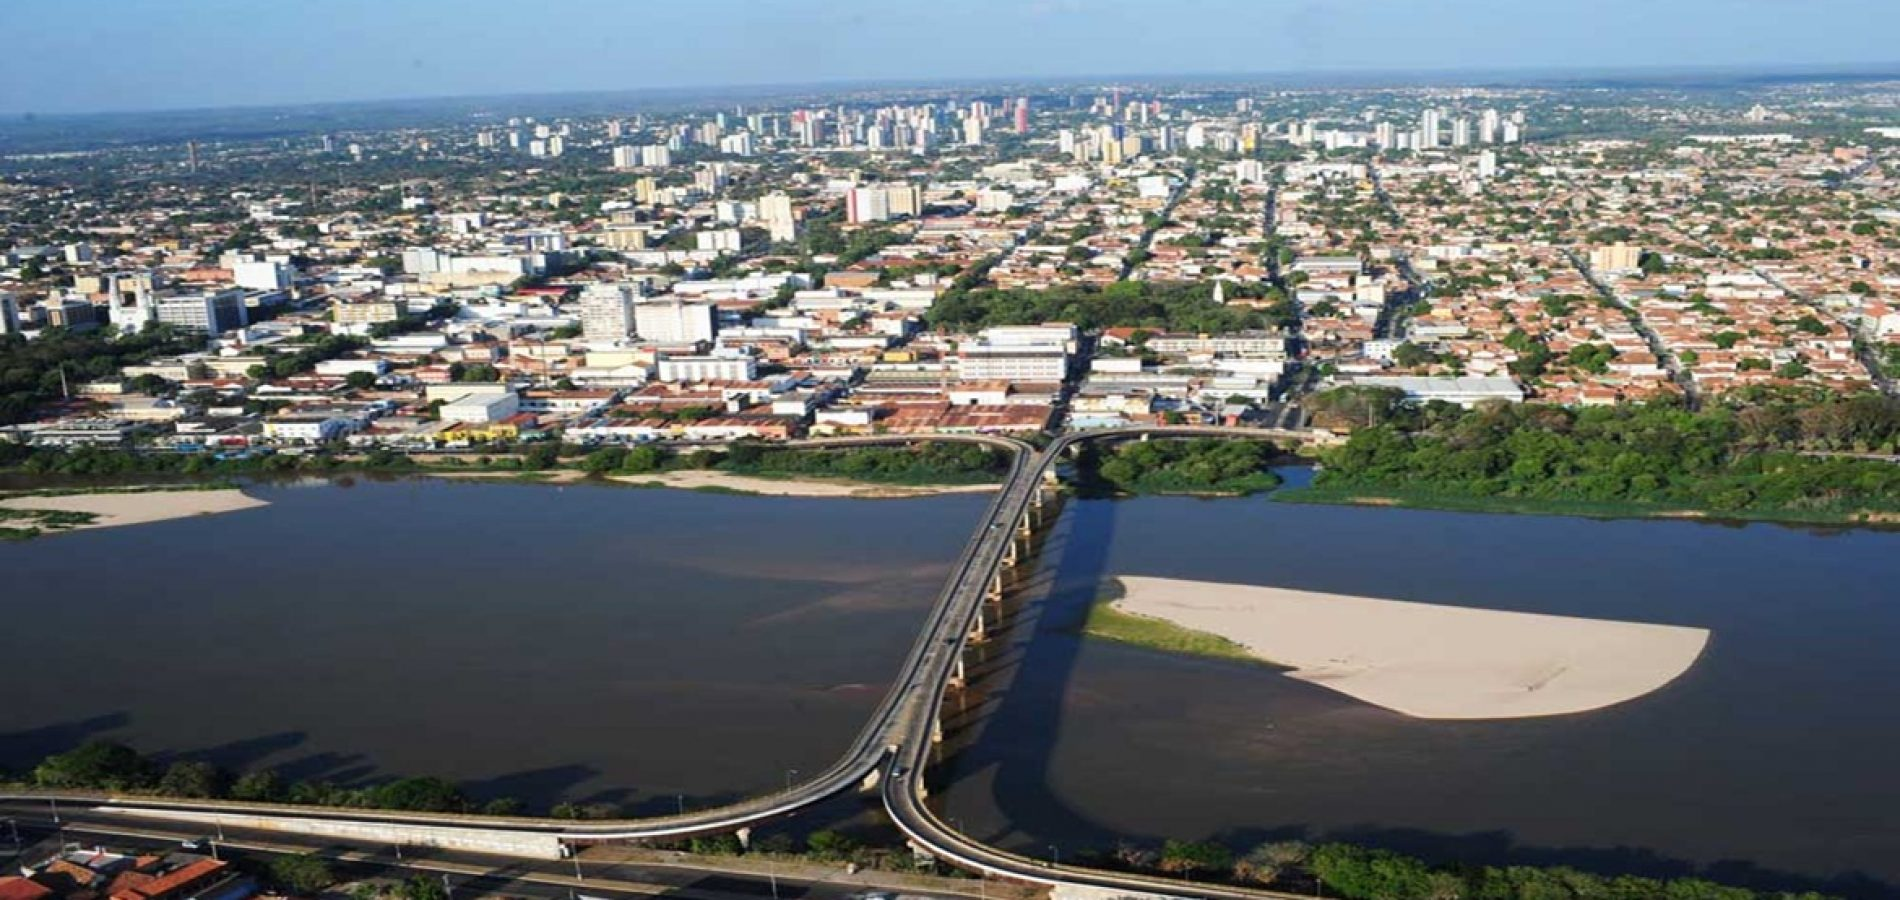 Confira as cidades com maior índice de isolamento social no Piauí